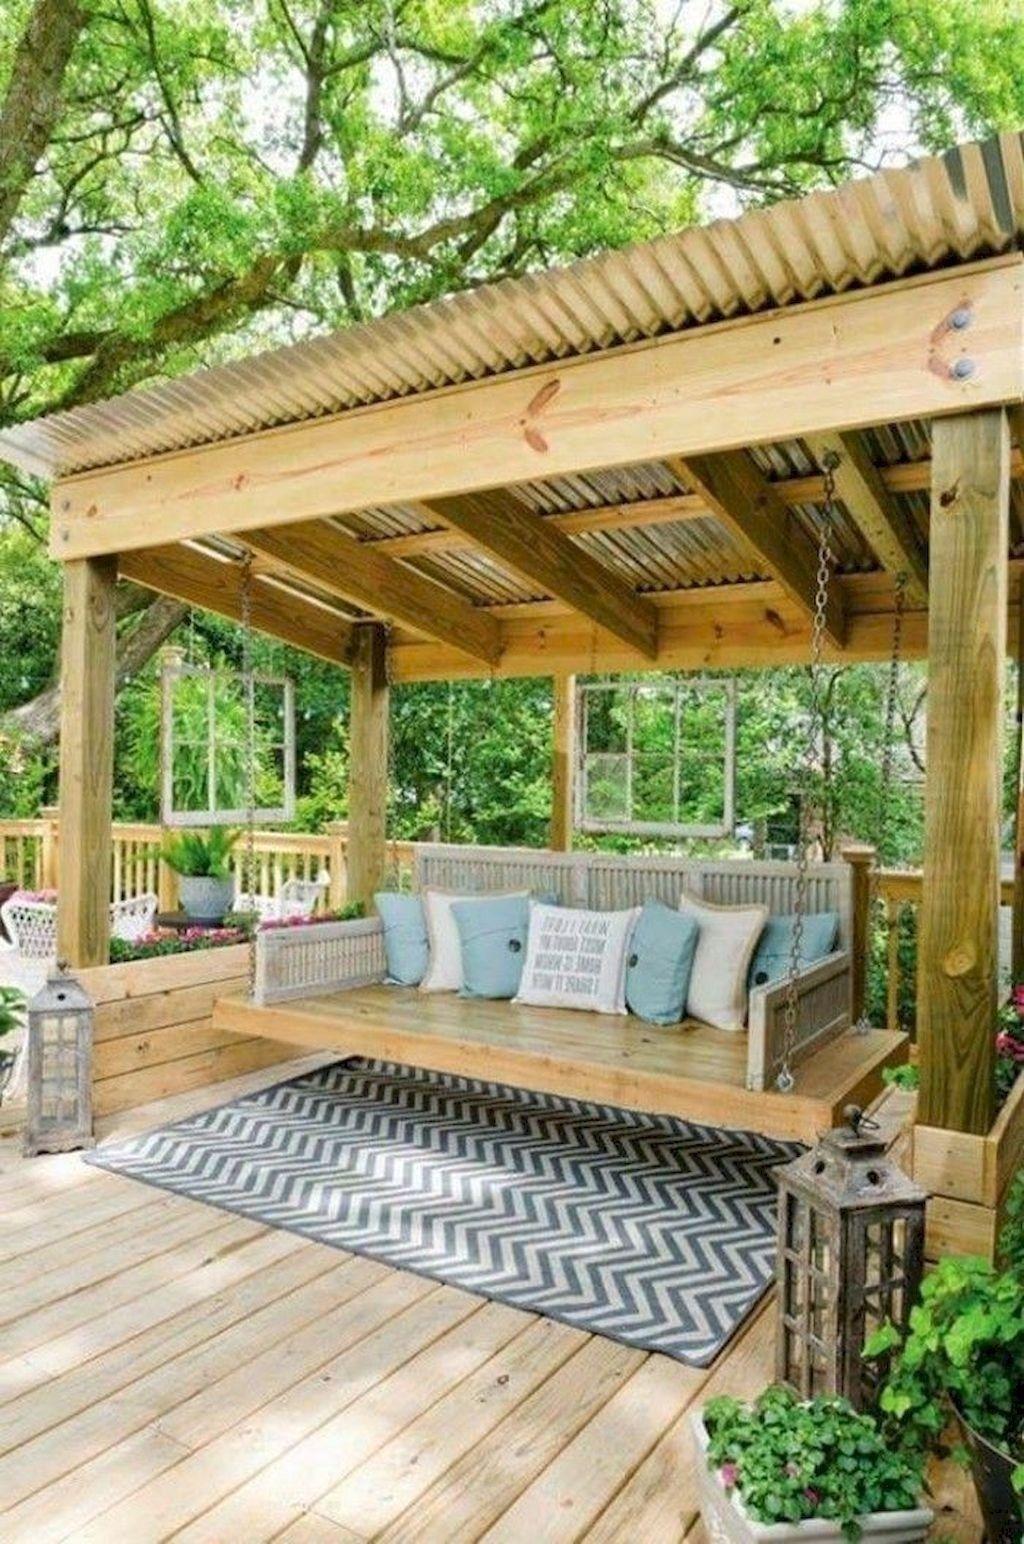 39 Exciting Diy Backyard Gazebo Design Ideas In 2020 Backyard